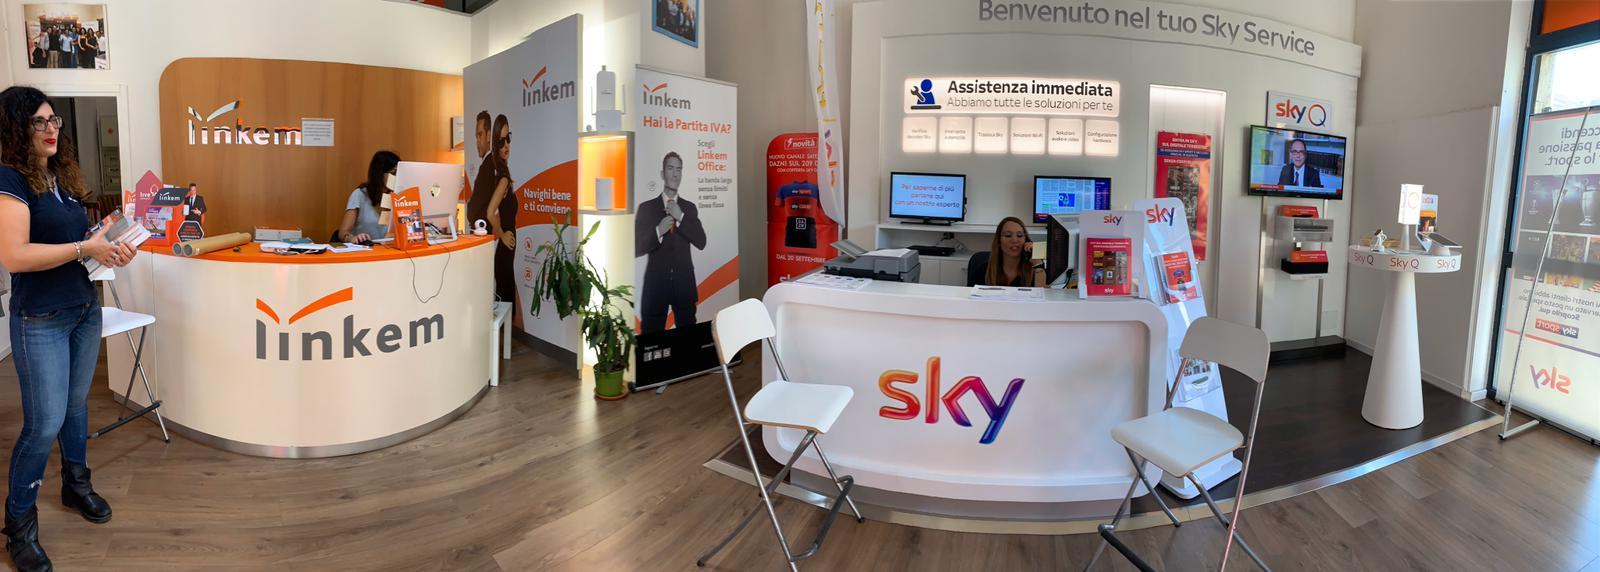 Centro assistenza Sky a Ragusa